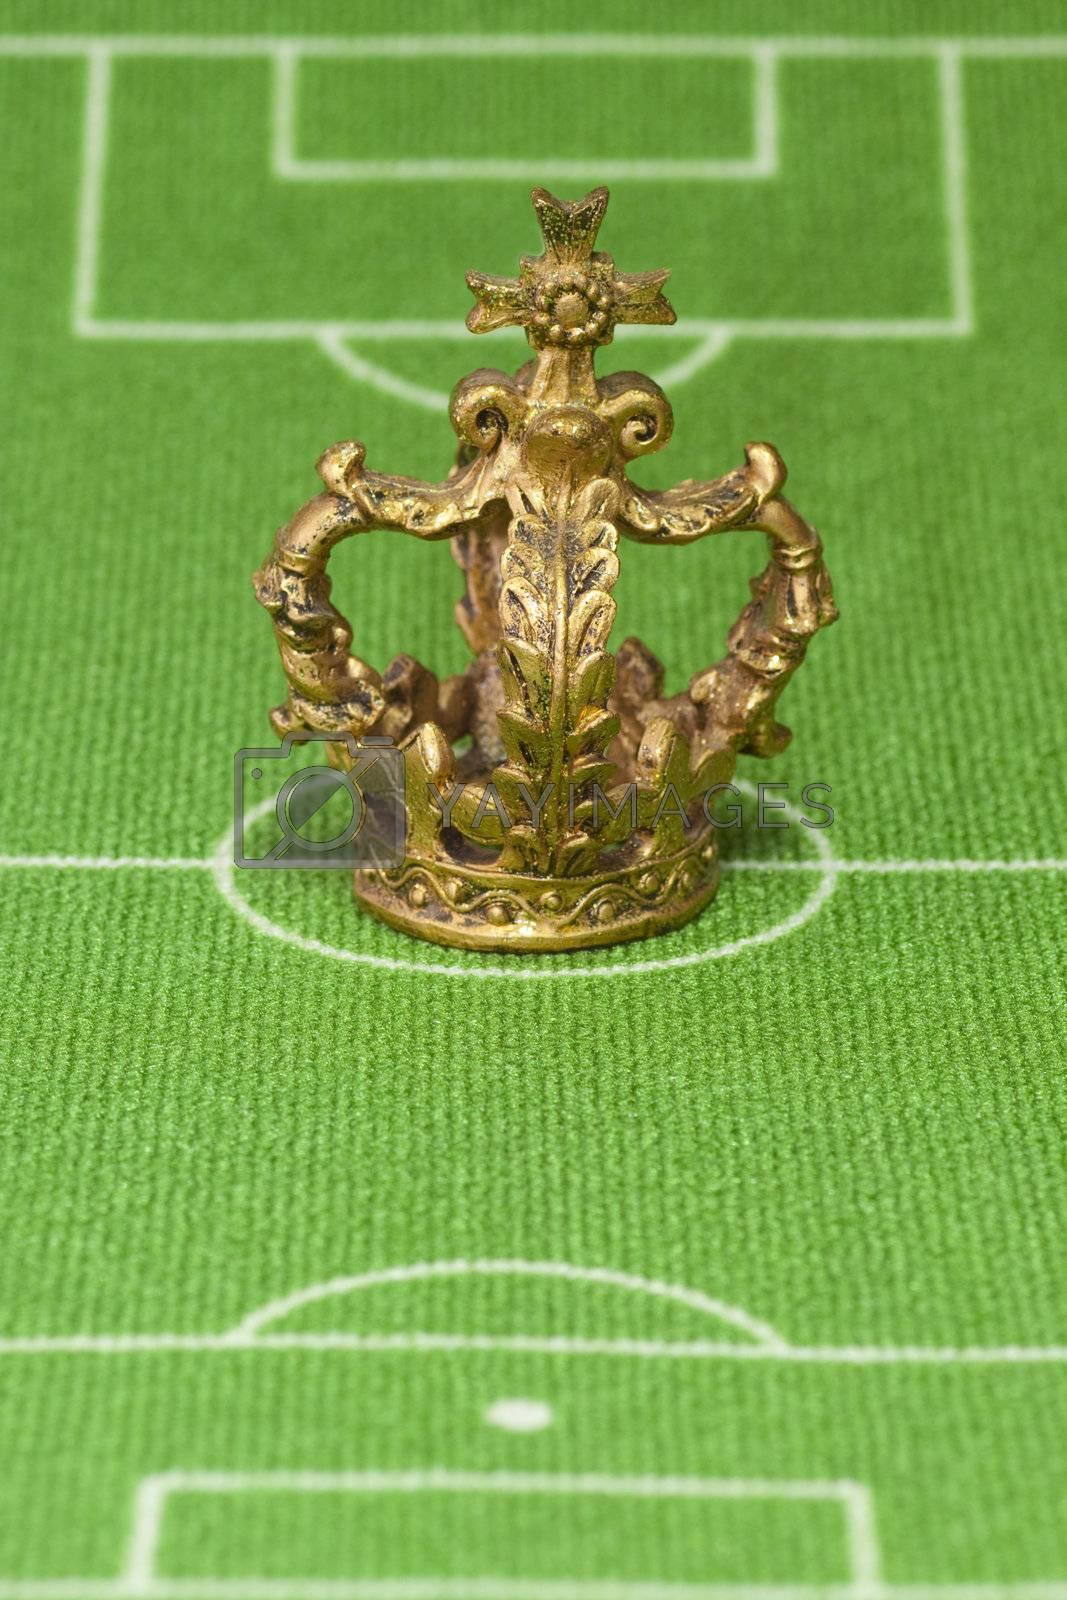 Symbol photo - crown on a soccer field. Shot in studio.